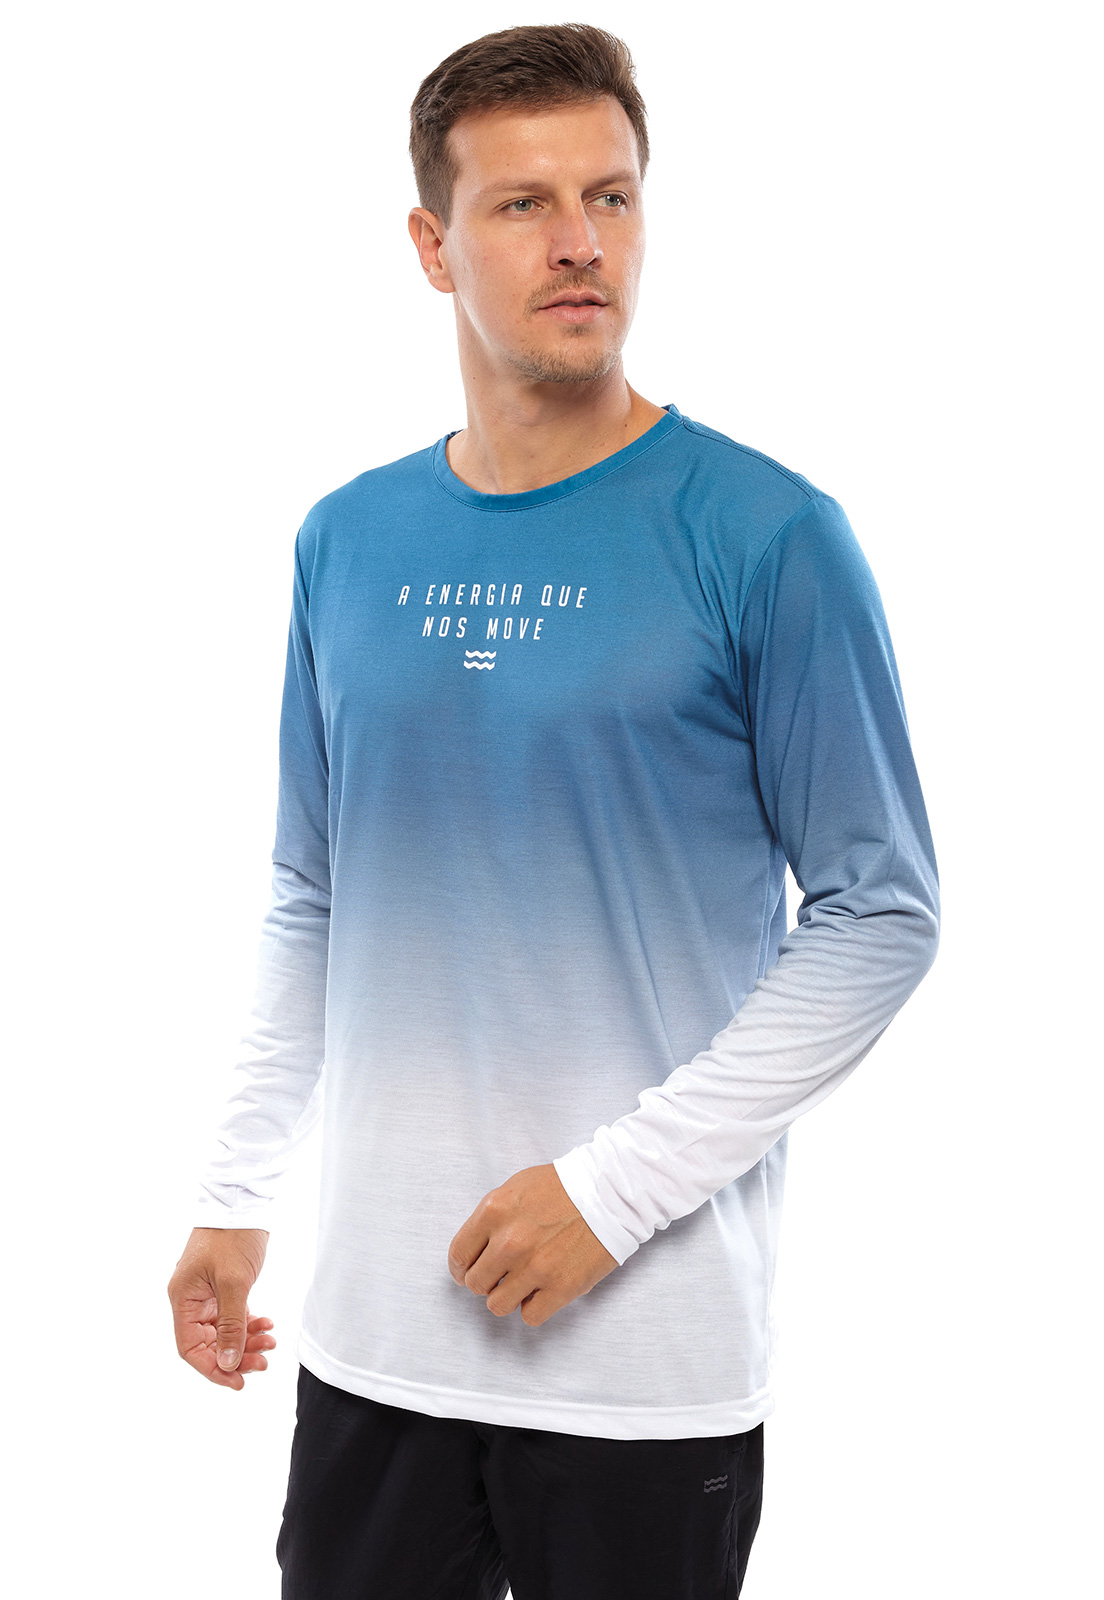 Camiseta Vida Marinha Manga Longa Branco/Azul